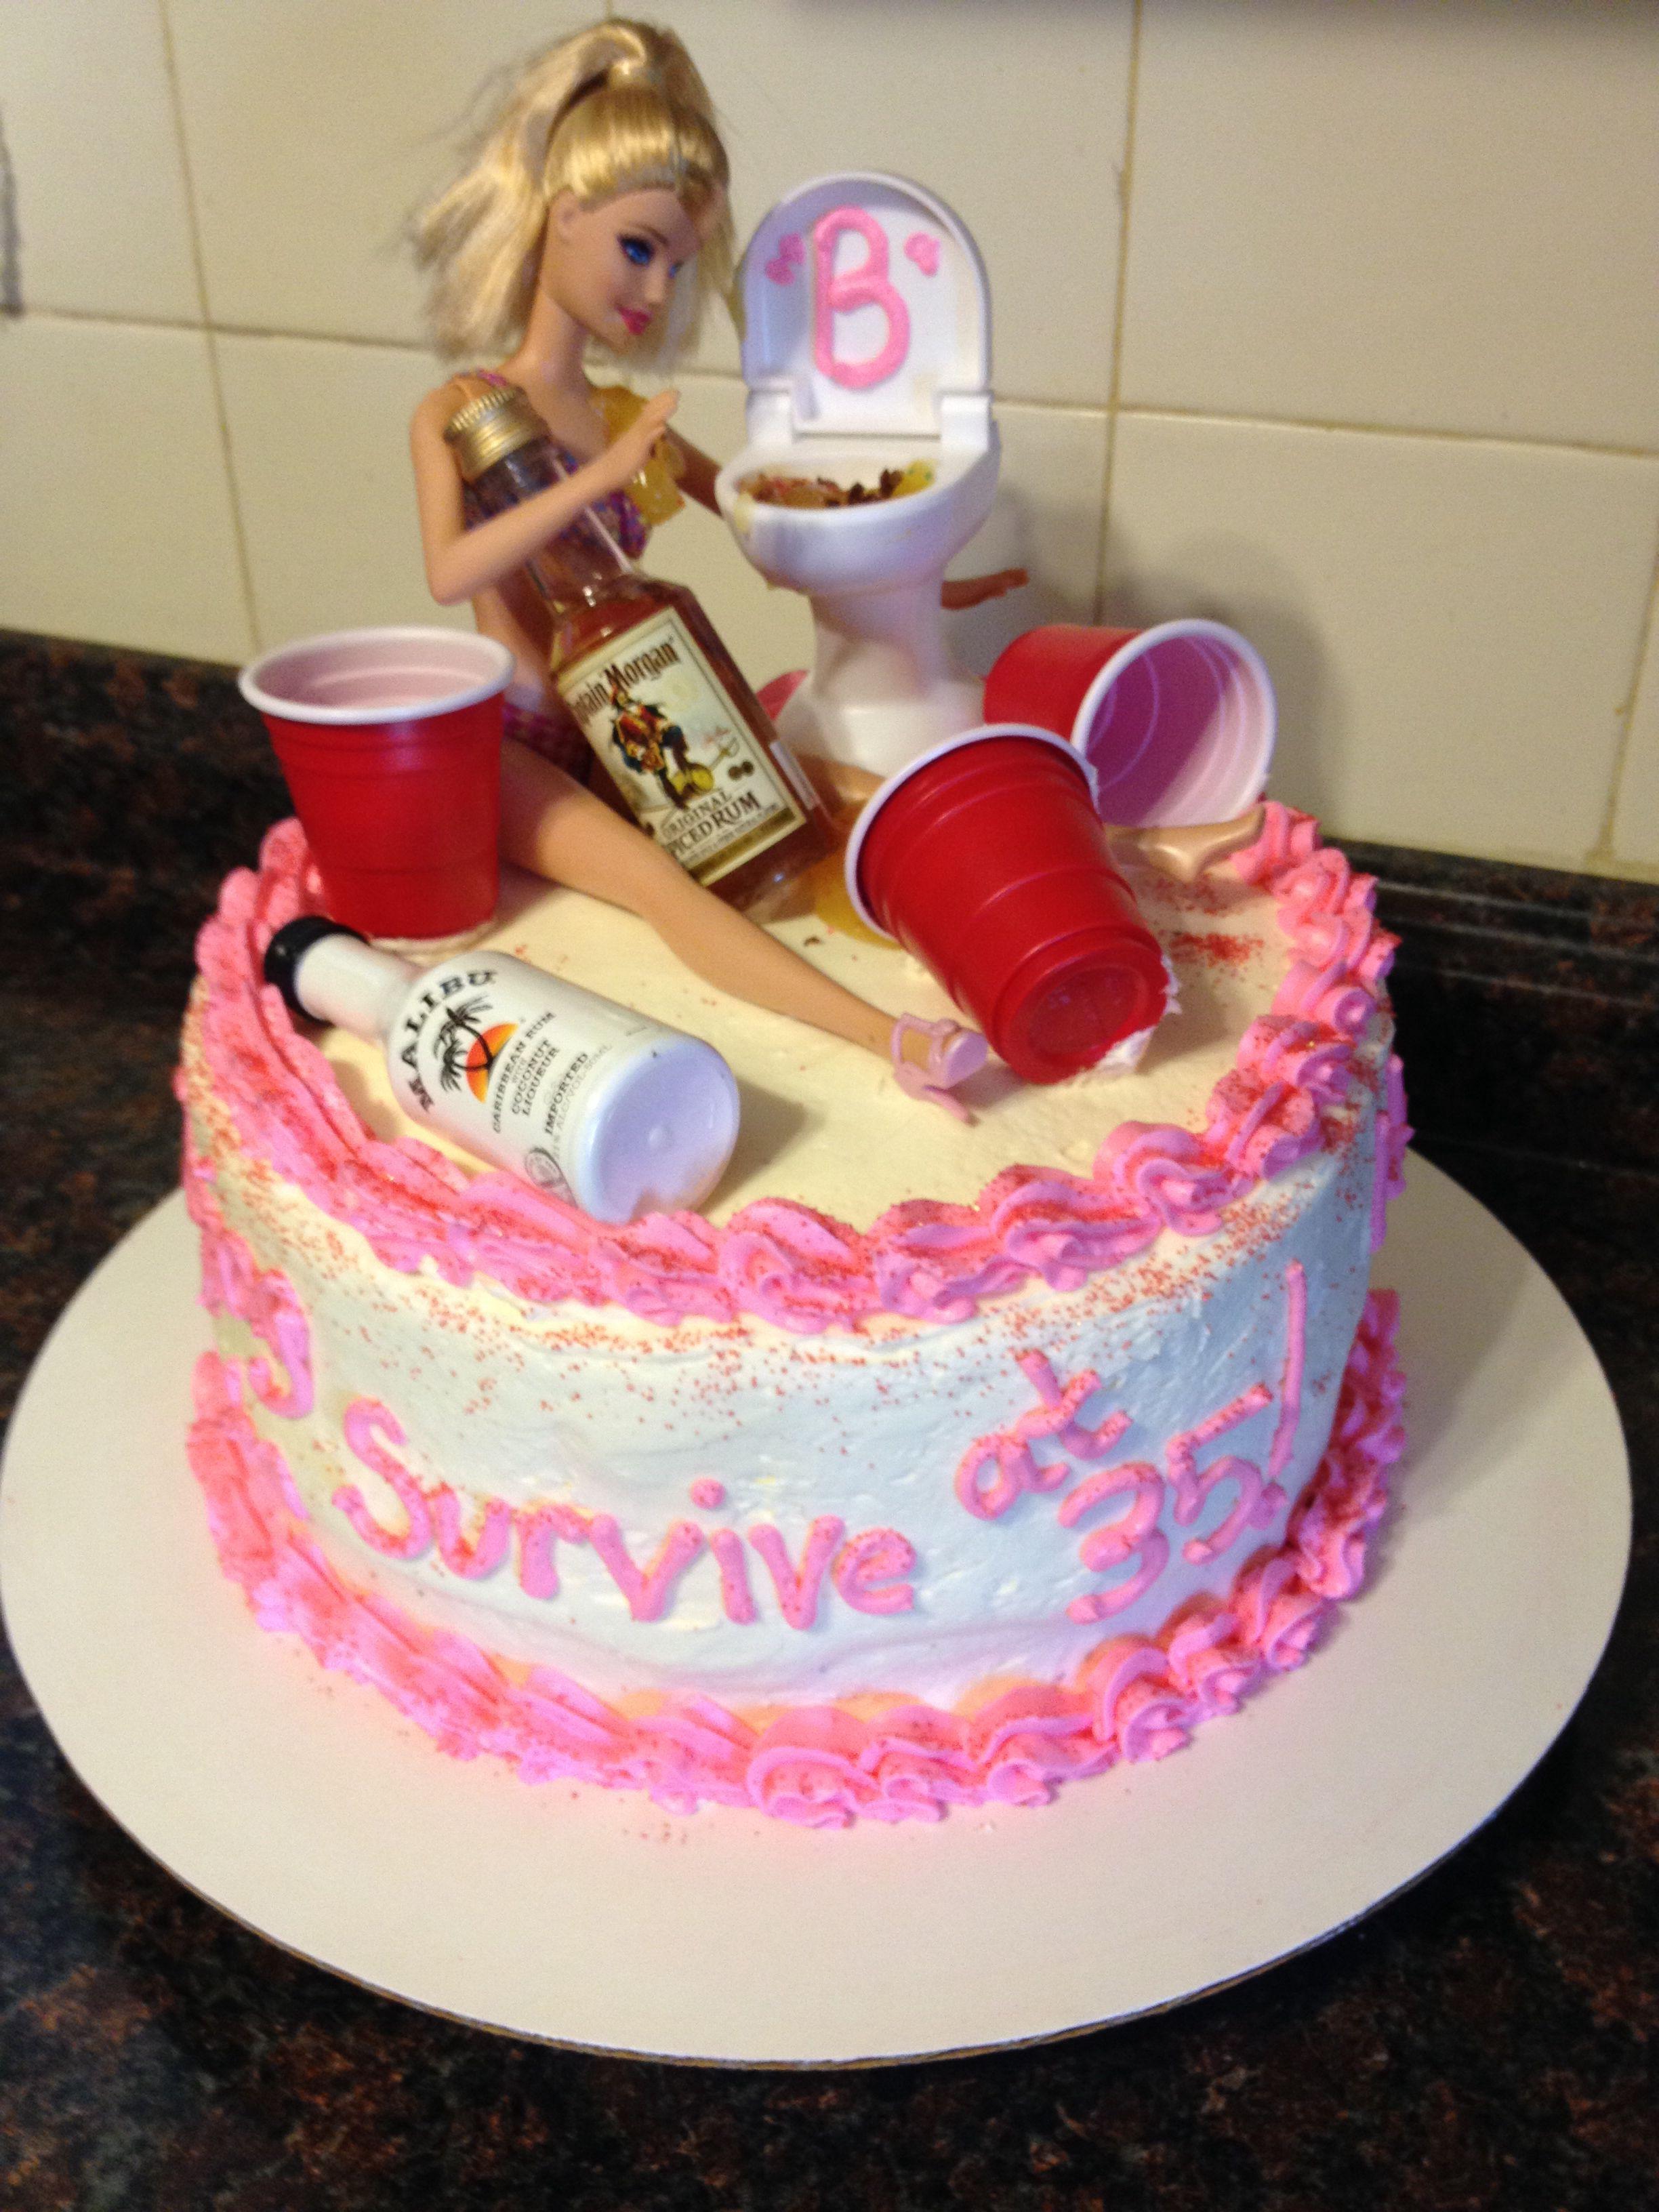 50Th Birthday Cake - CakeCentral.com |Funny Women Cake Ideas